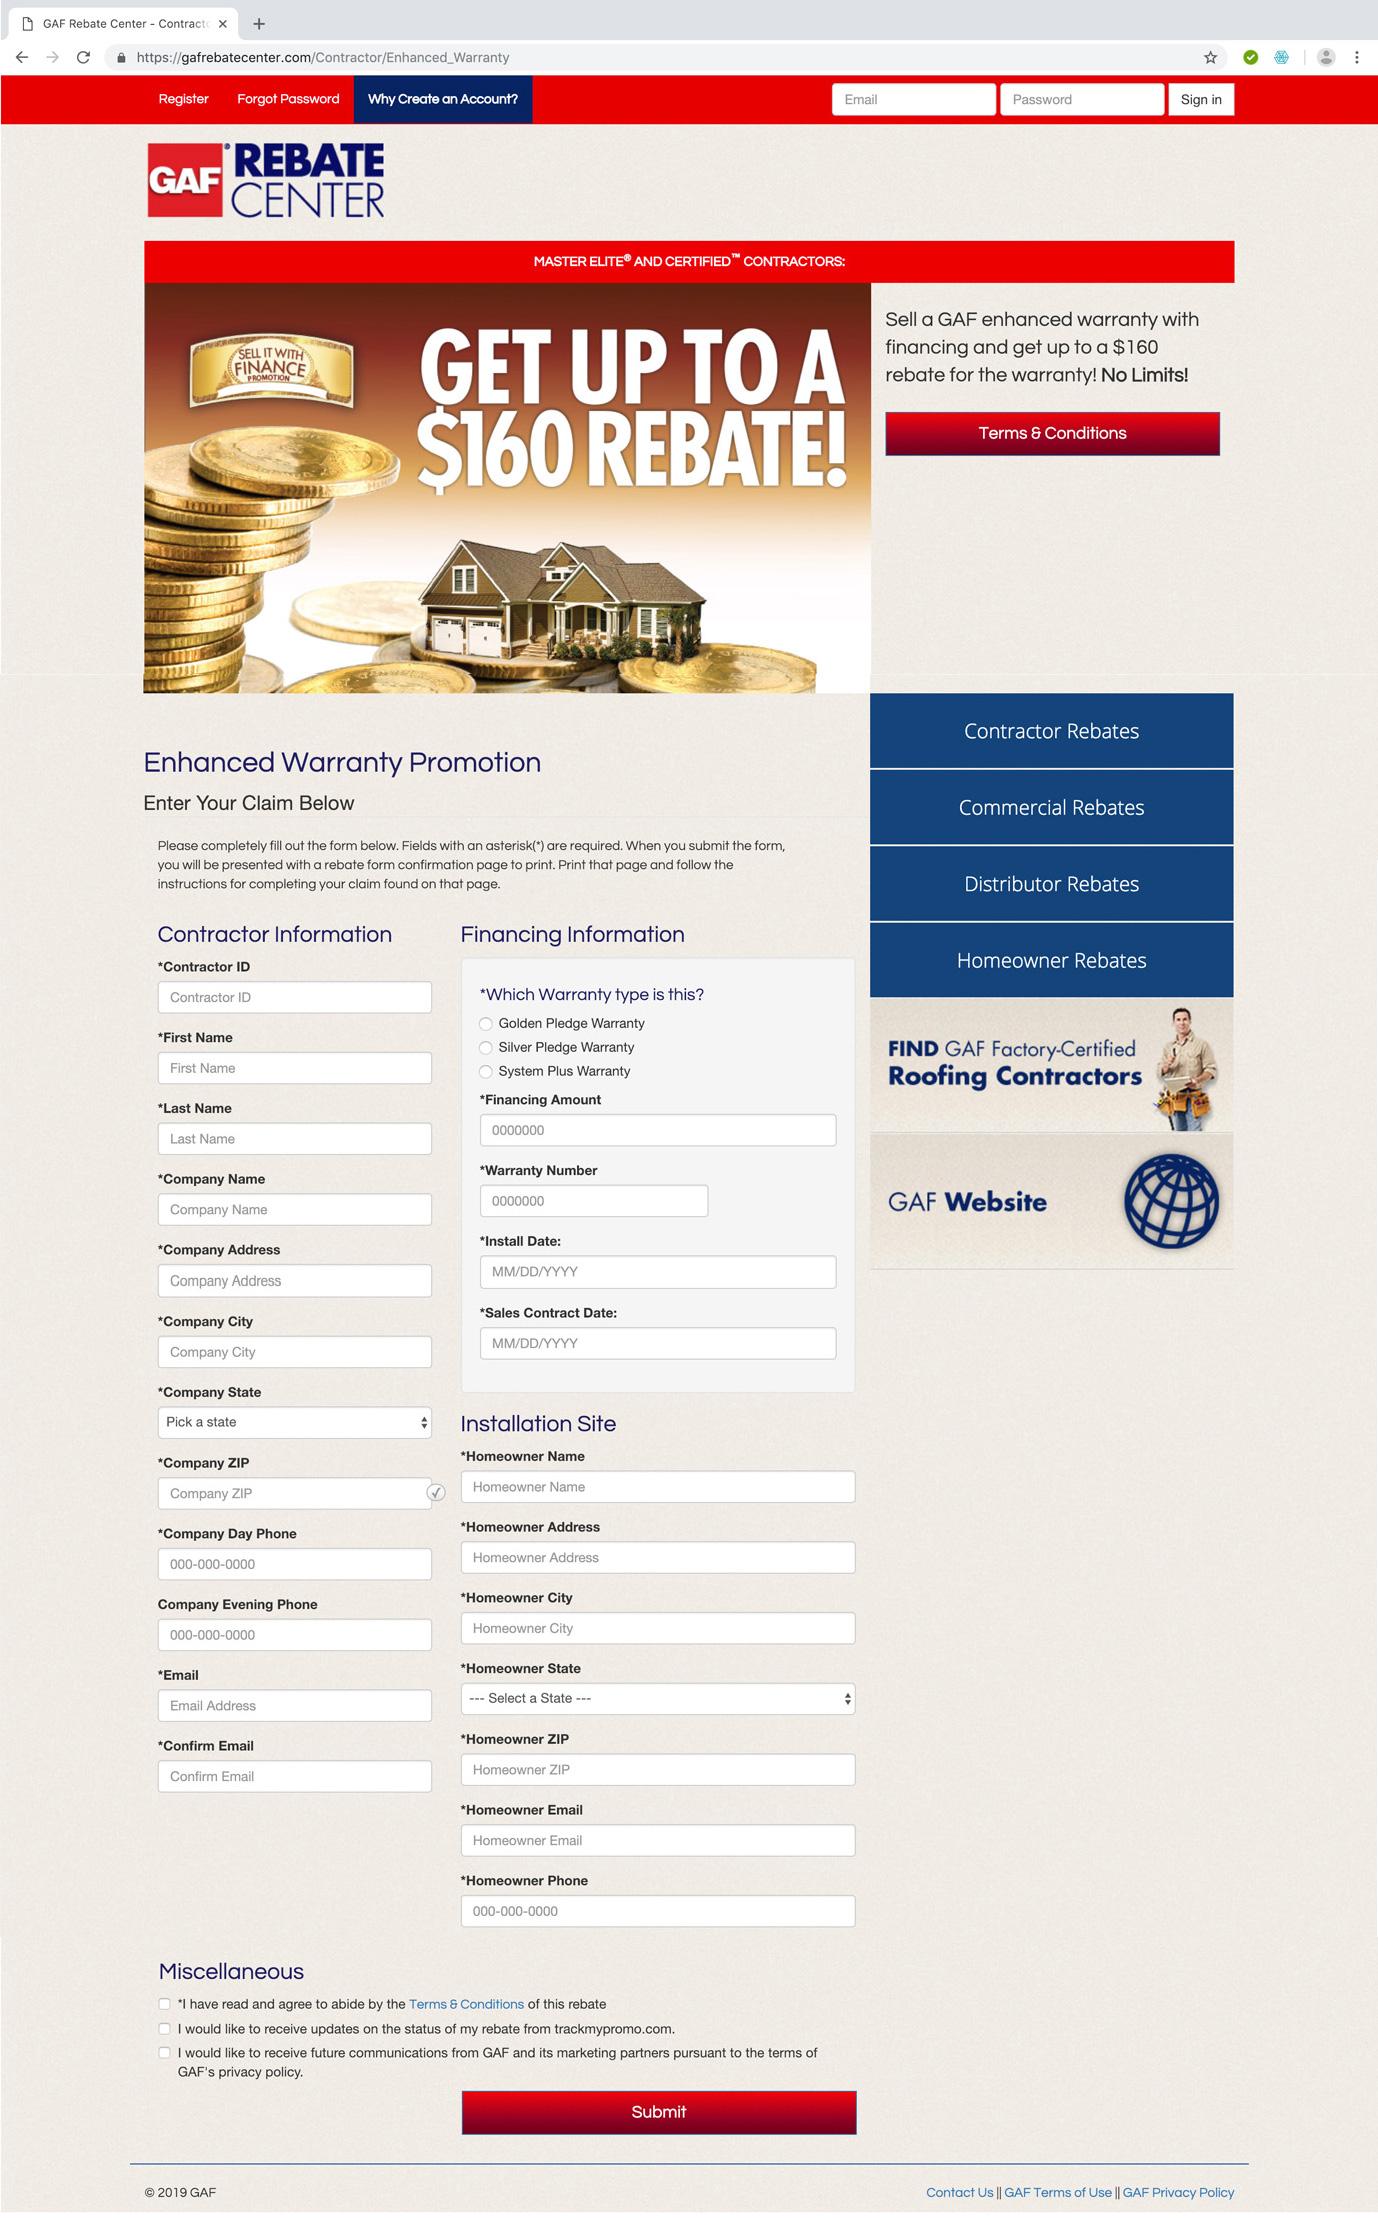 GAF Rebate Center Contractor Rebate Claim Form